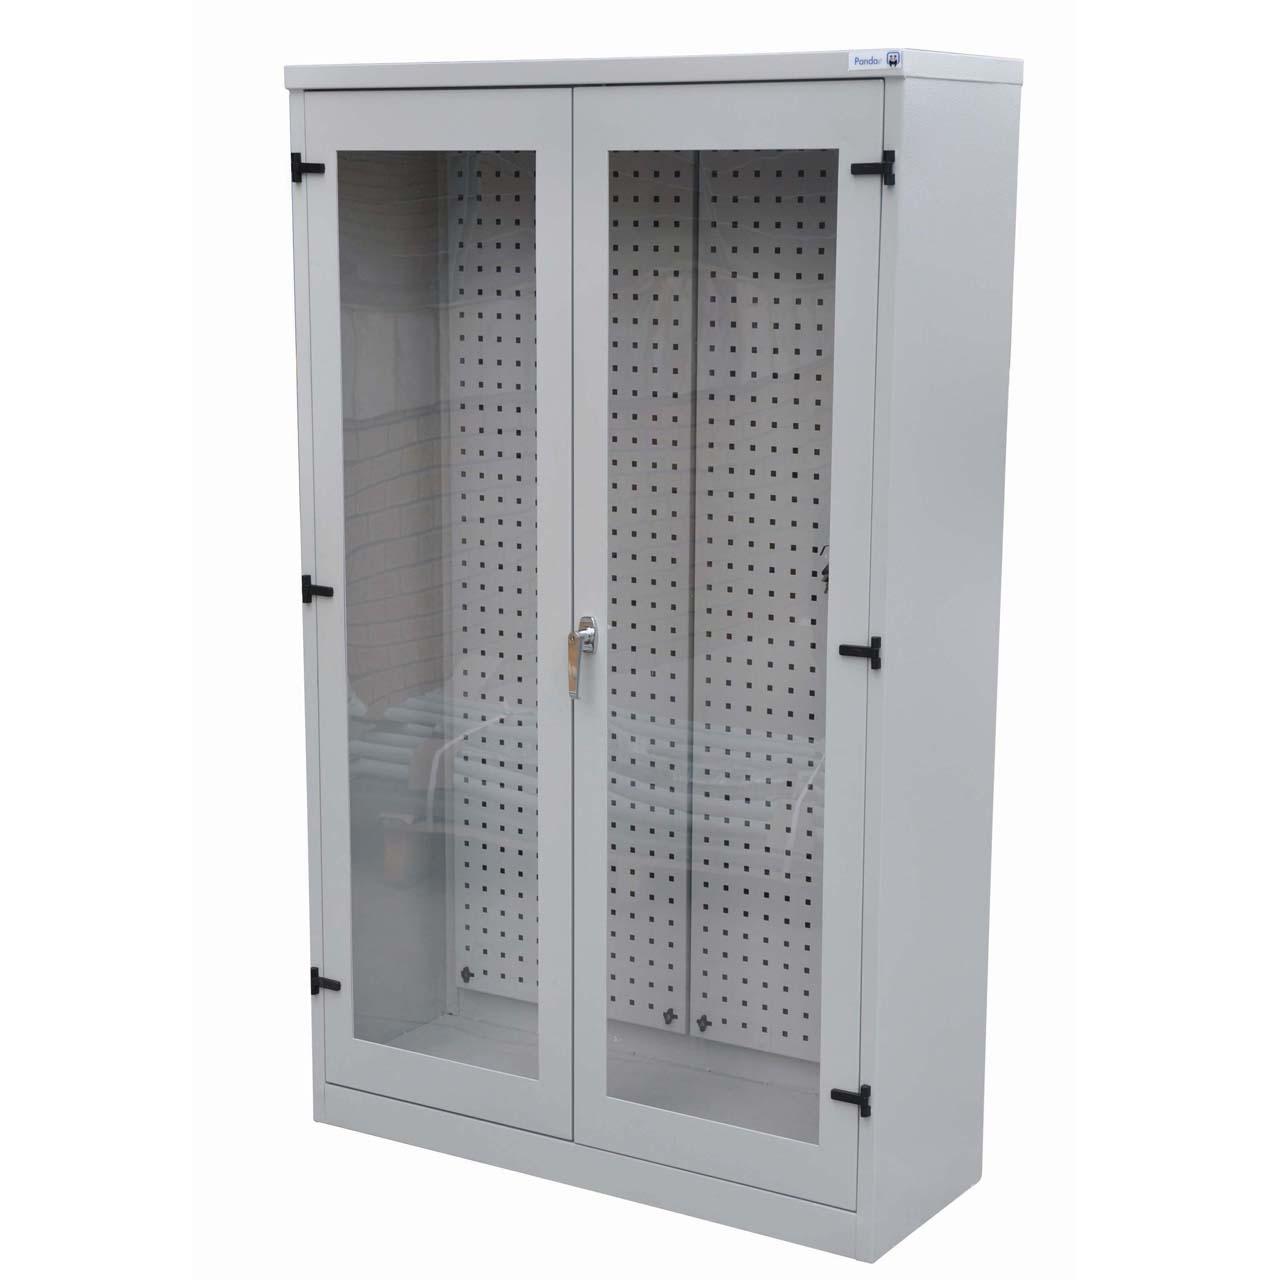 storage-cabinets-09  sc 1 st  Pandae Storage & Heavy Duty Storage Cabinets | Pandae Storage